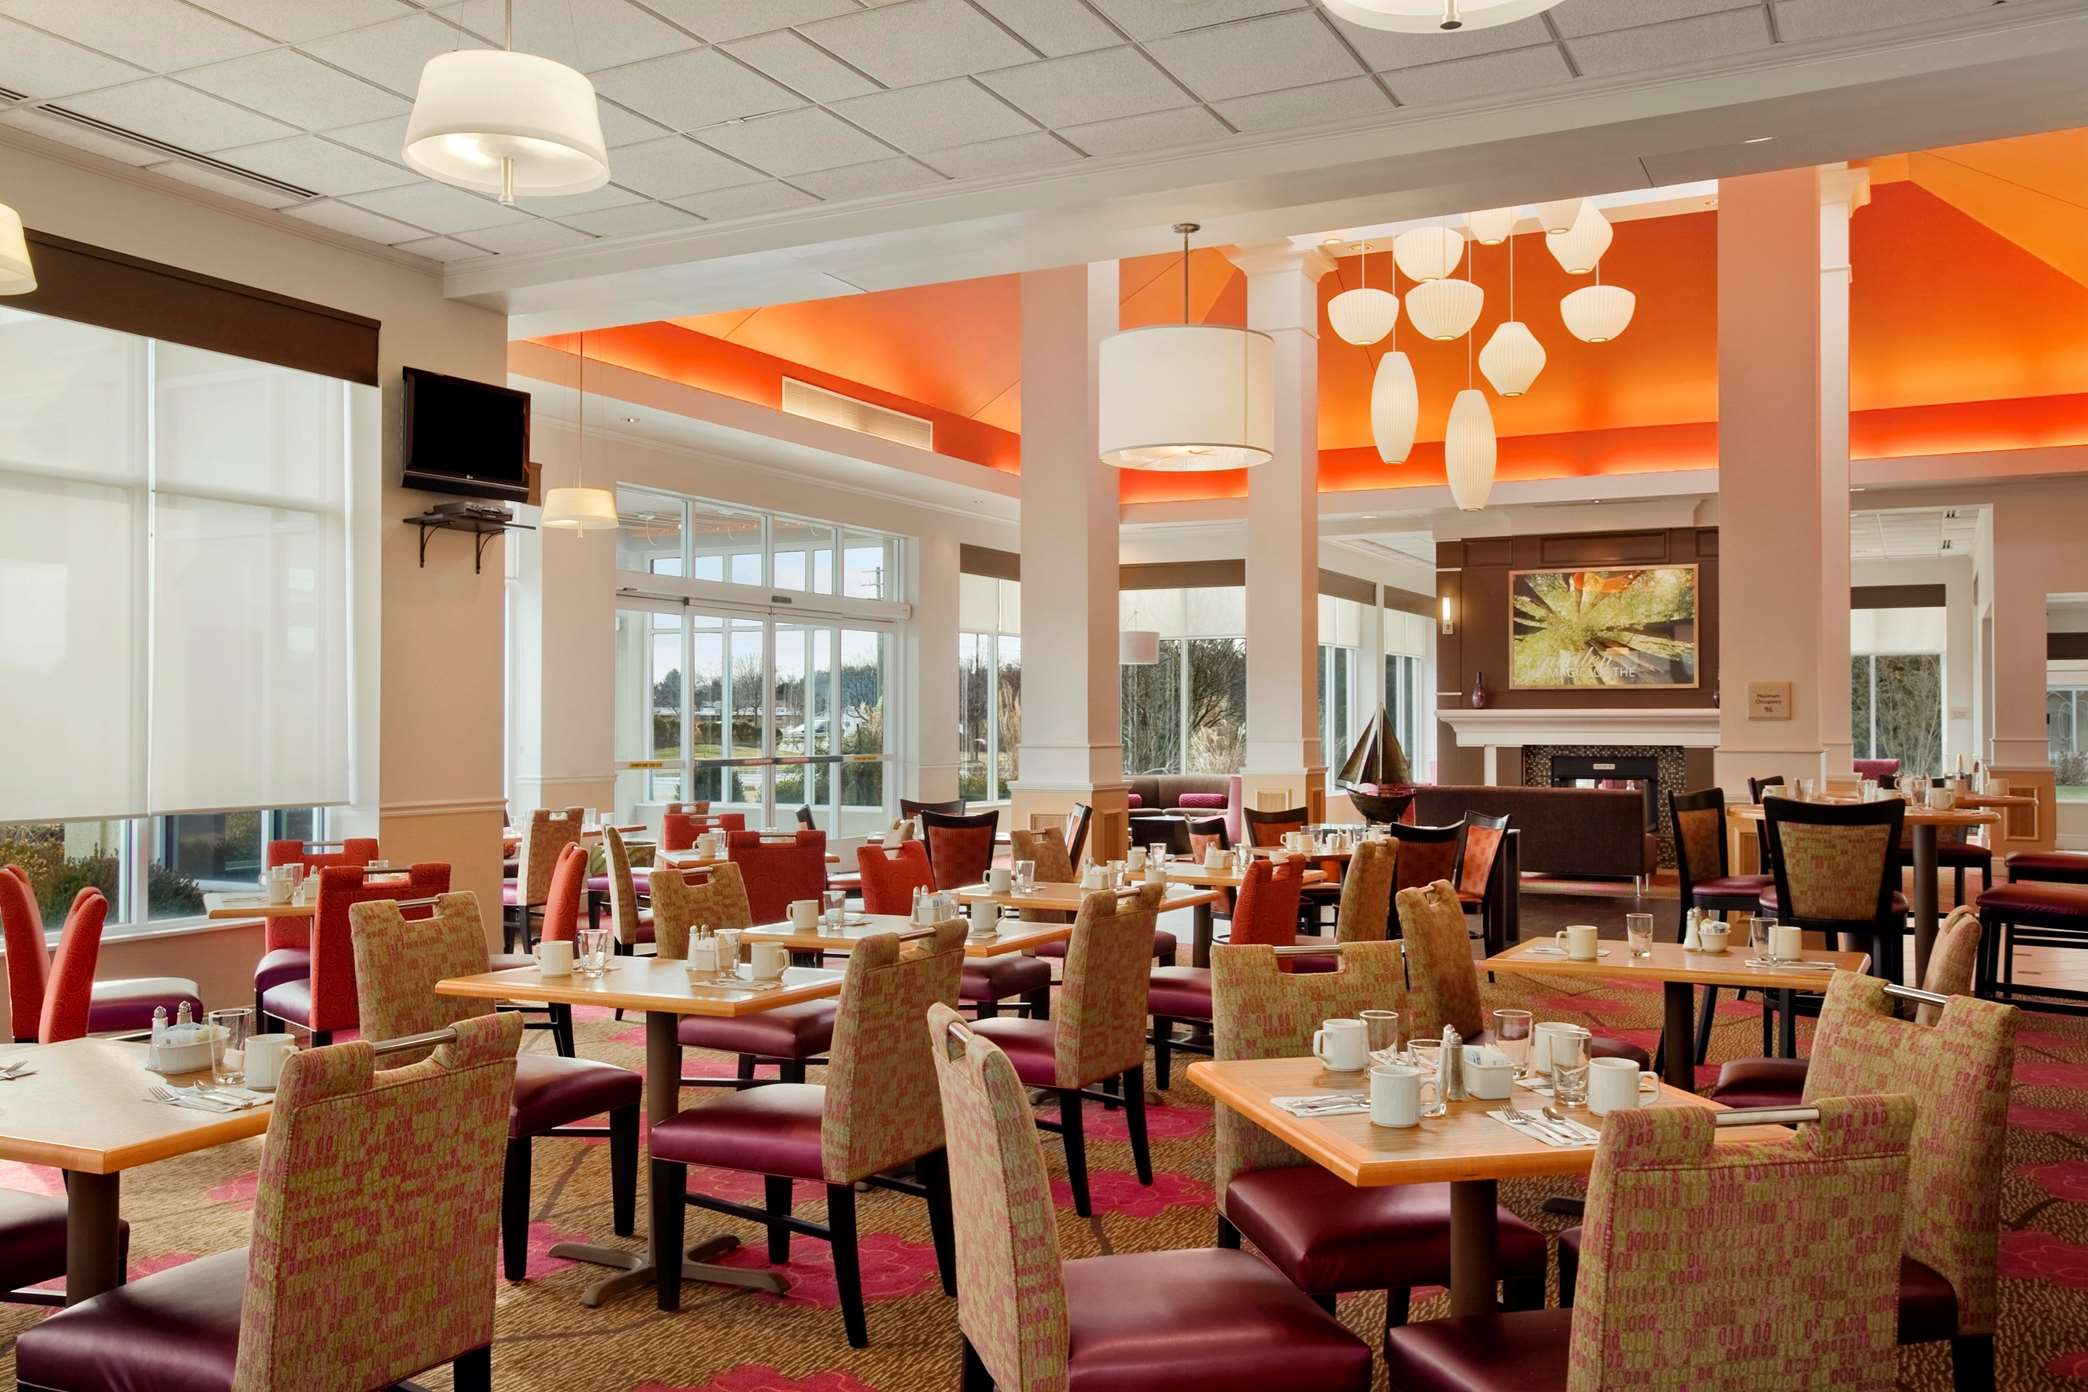 Hilton Garden Inn Islip/MacArthur Airport image 8